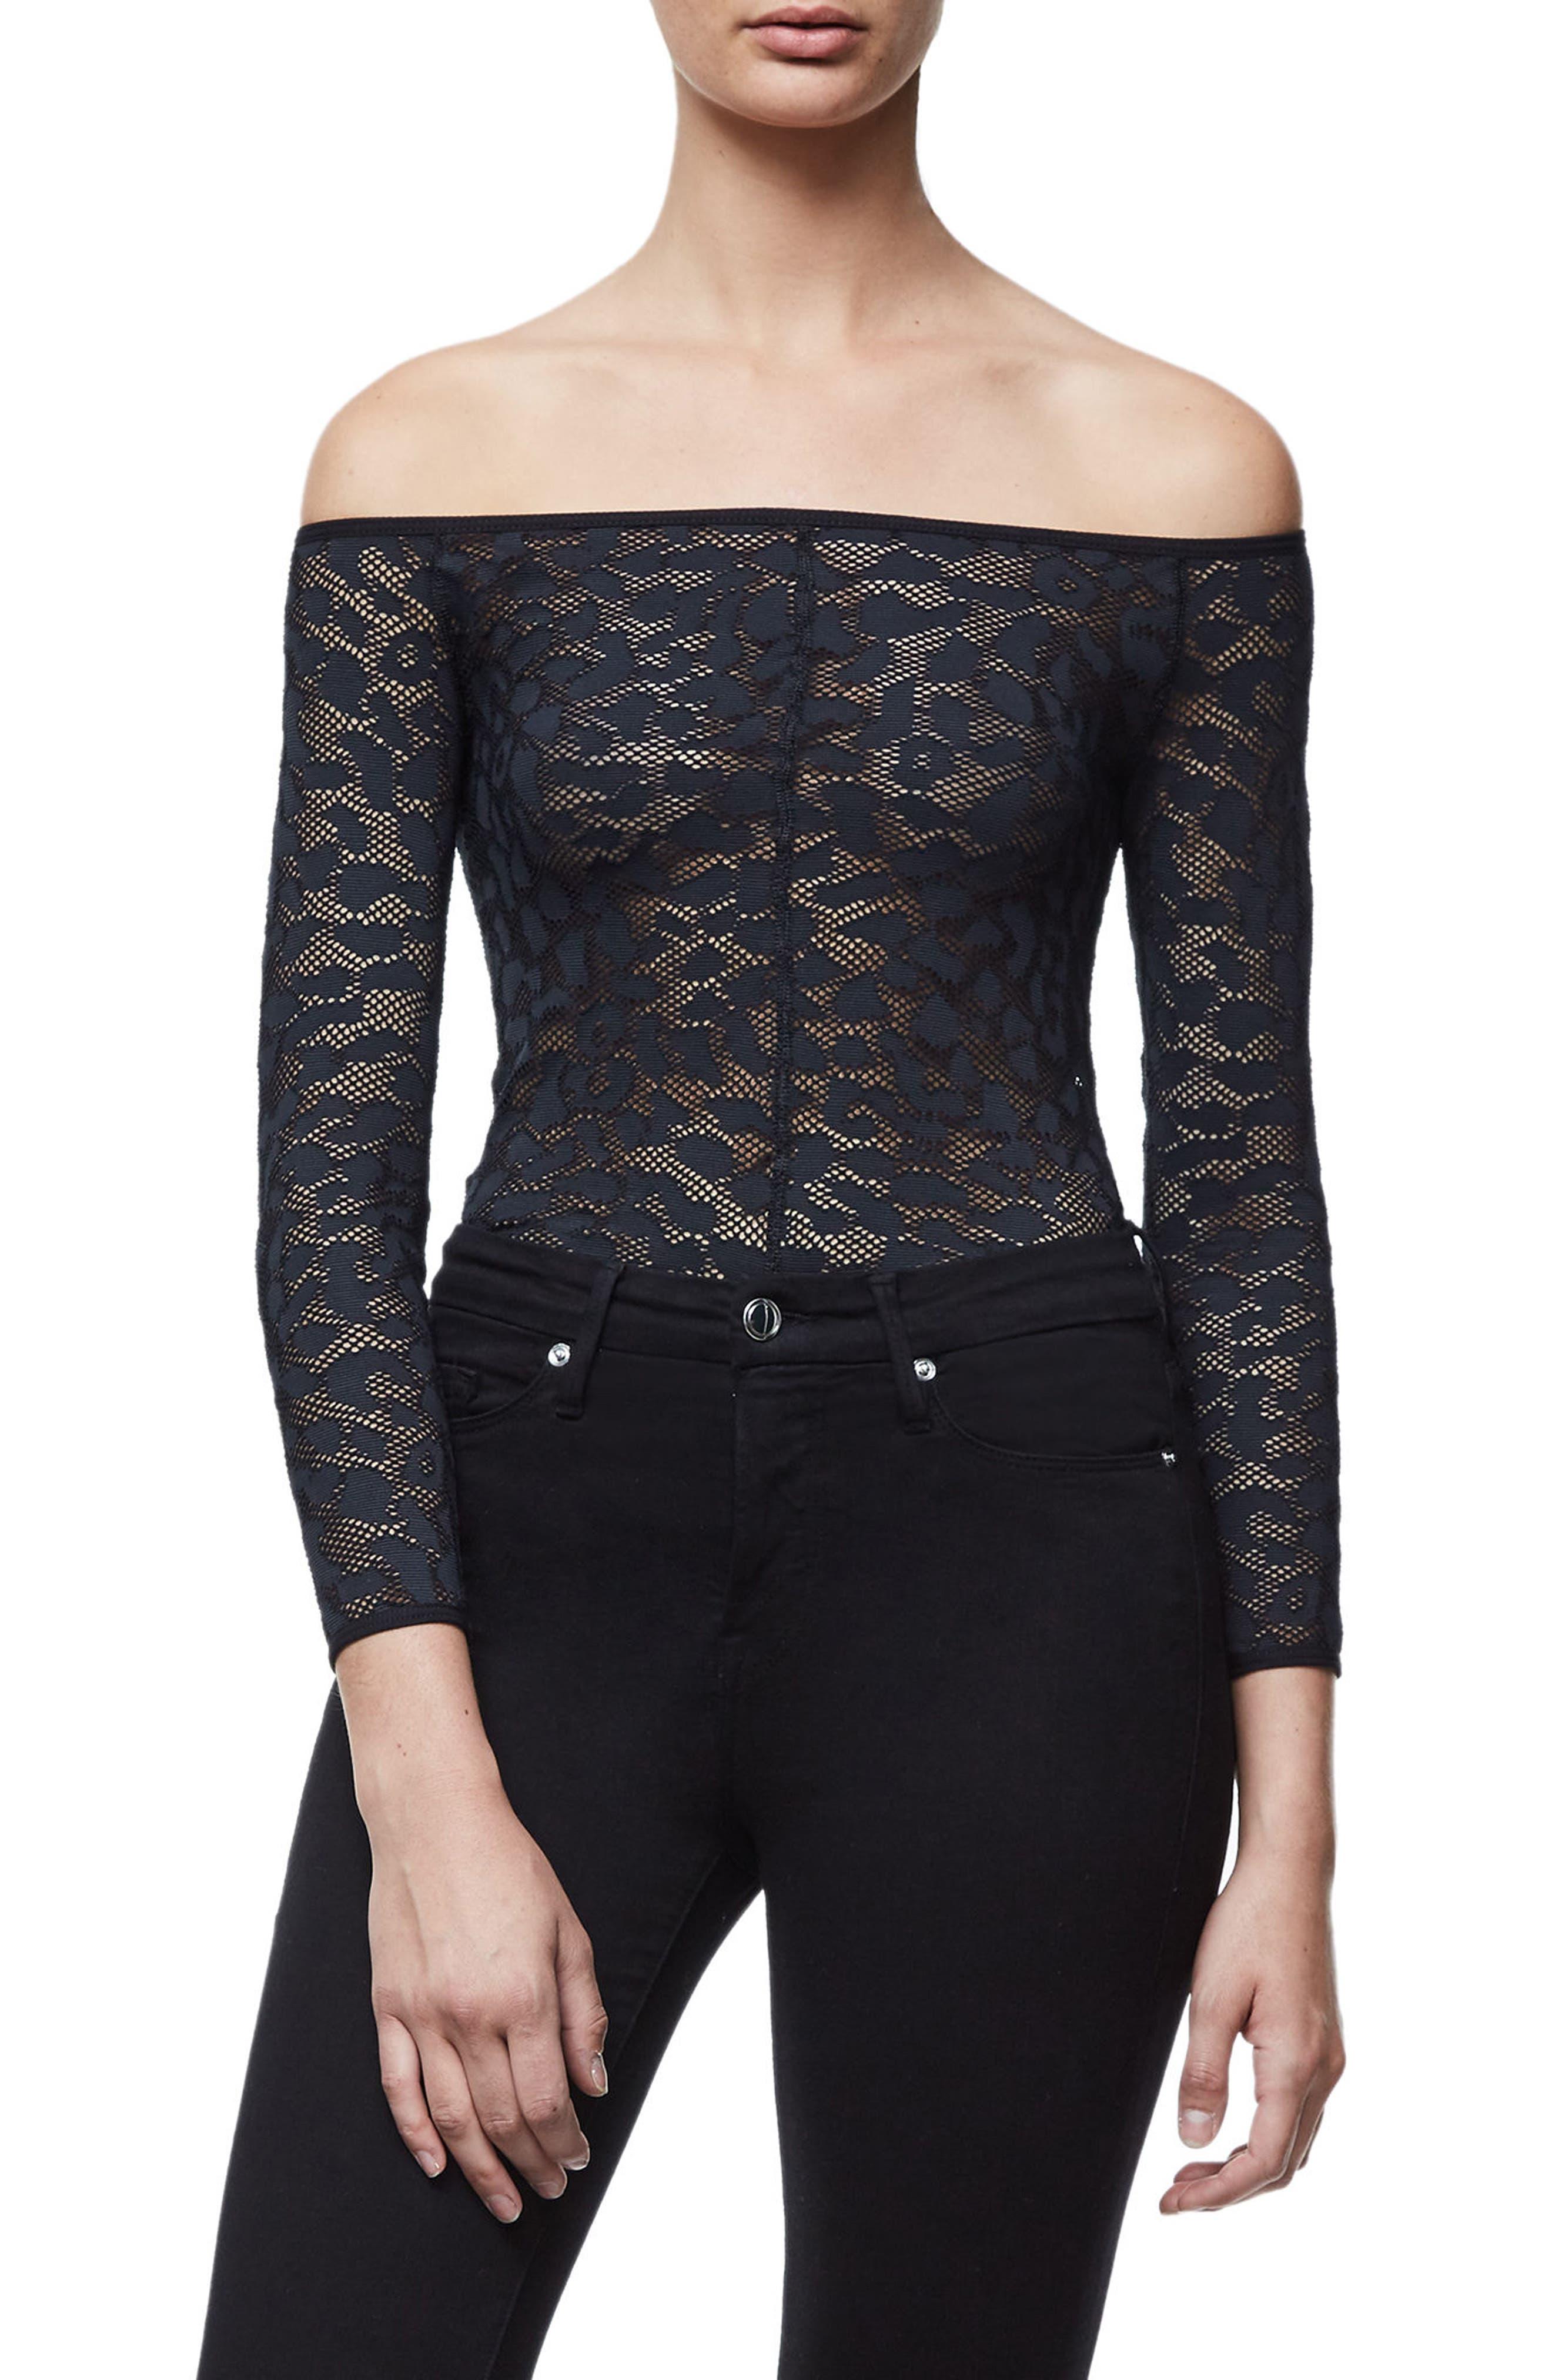 Good Body Shoulder Action Bodysuit,                         Main,                         color, Black